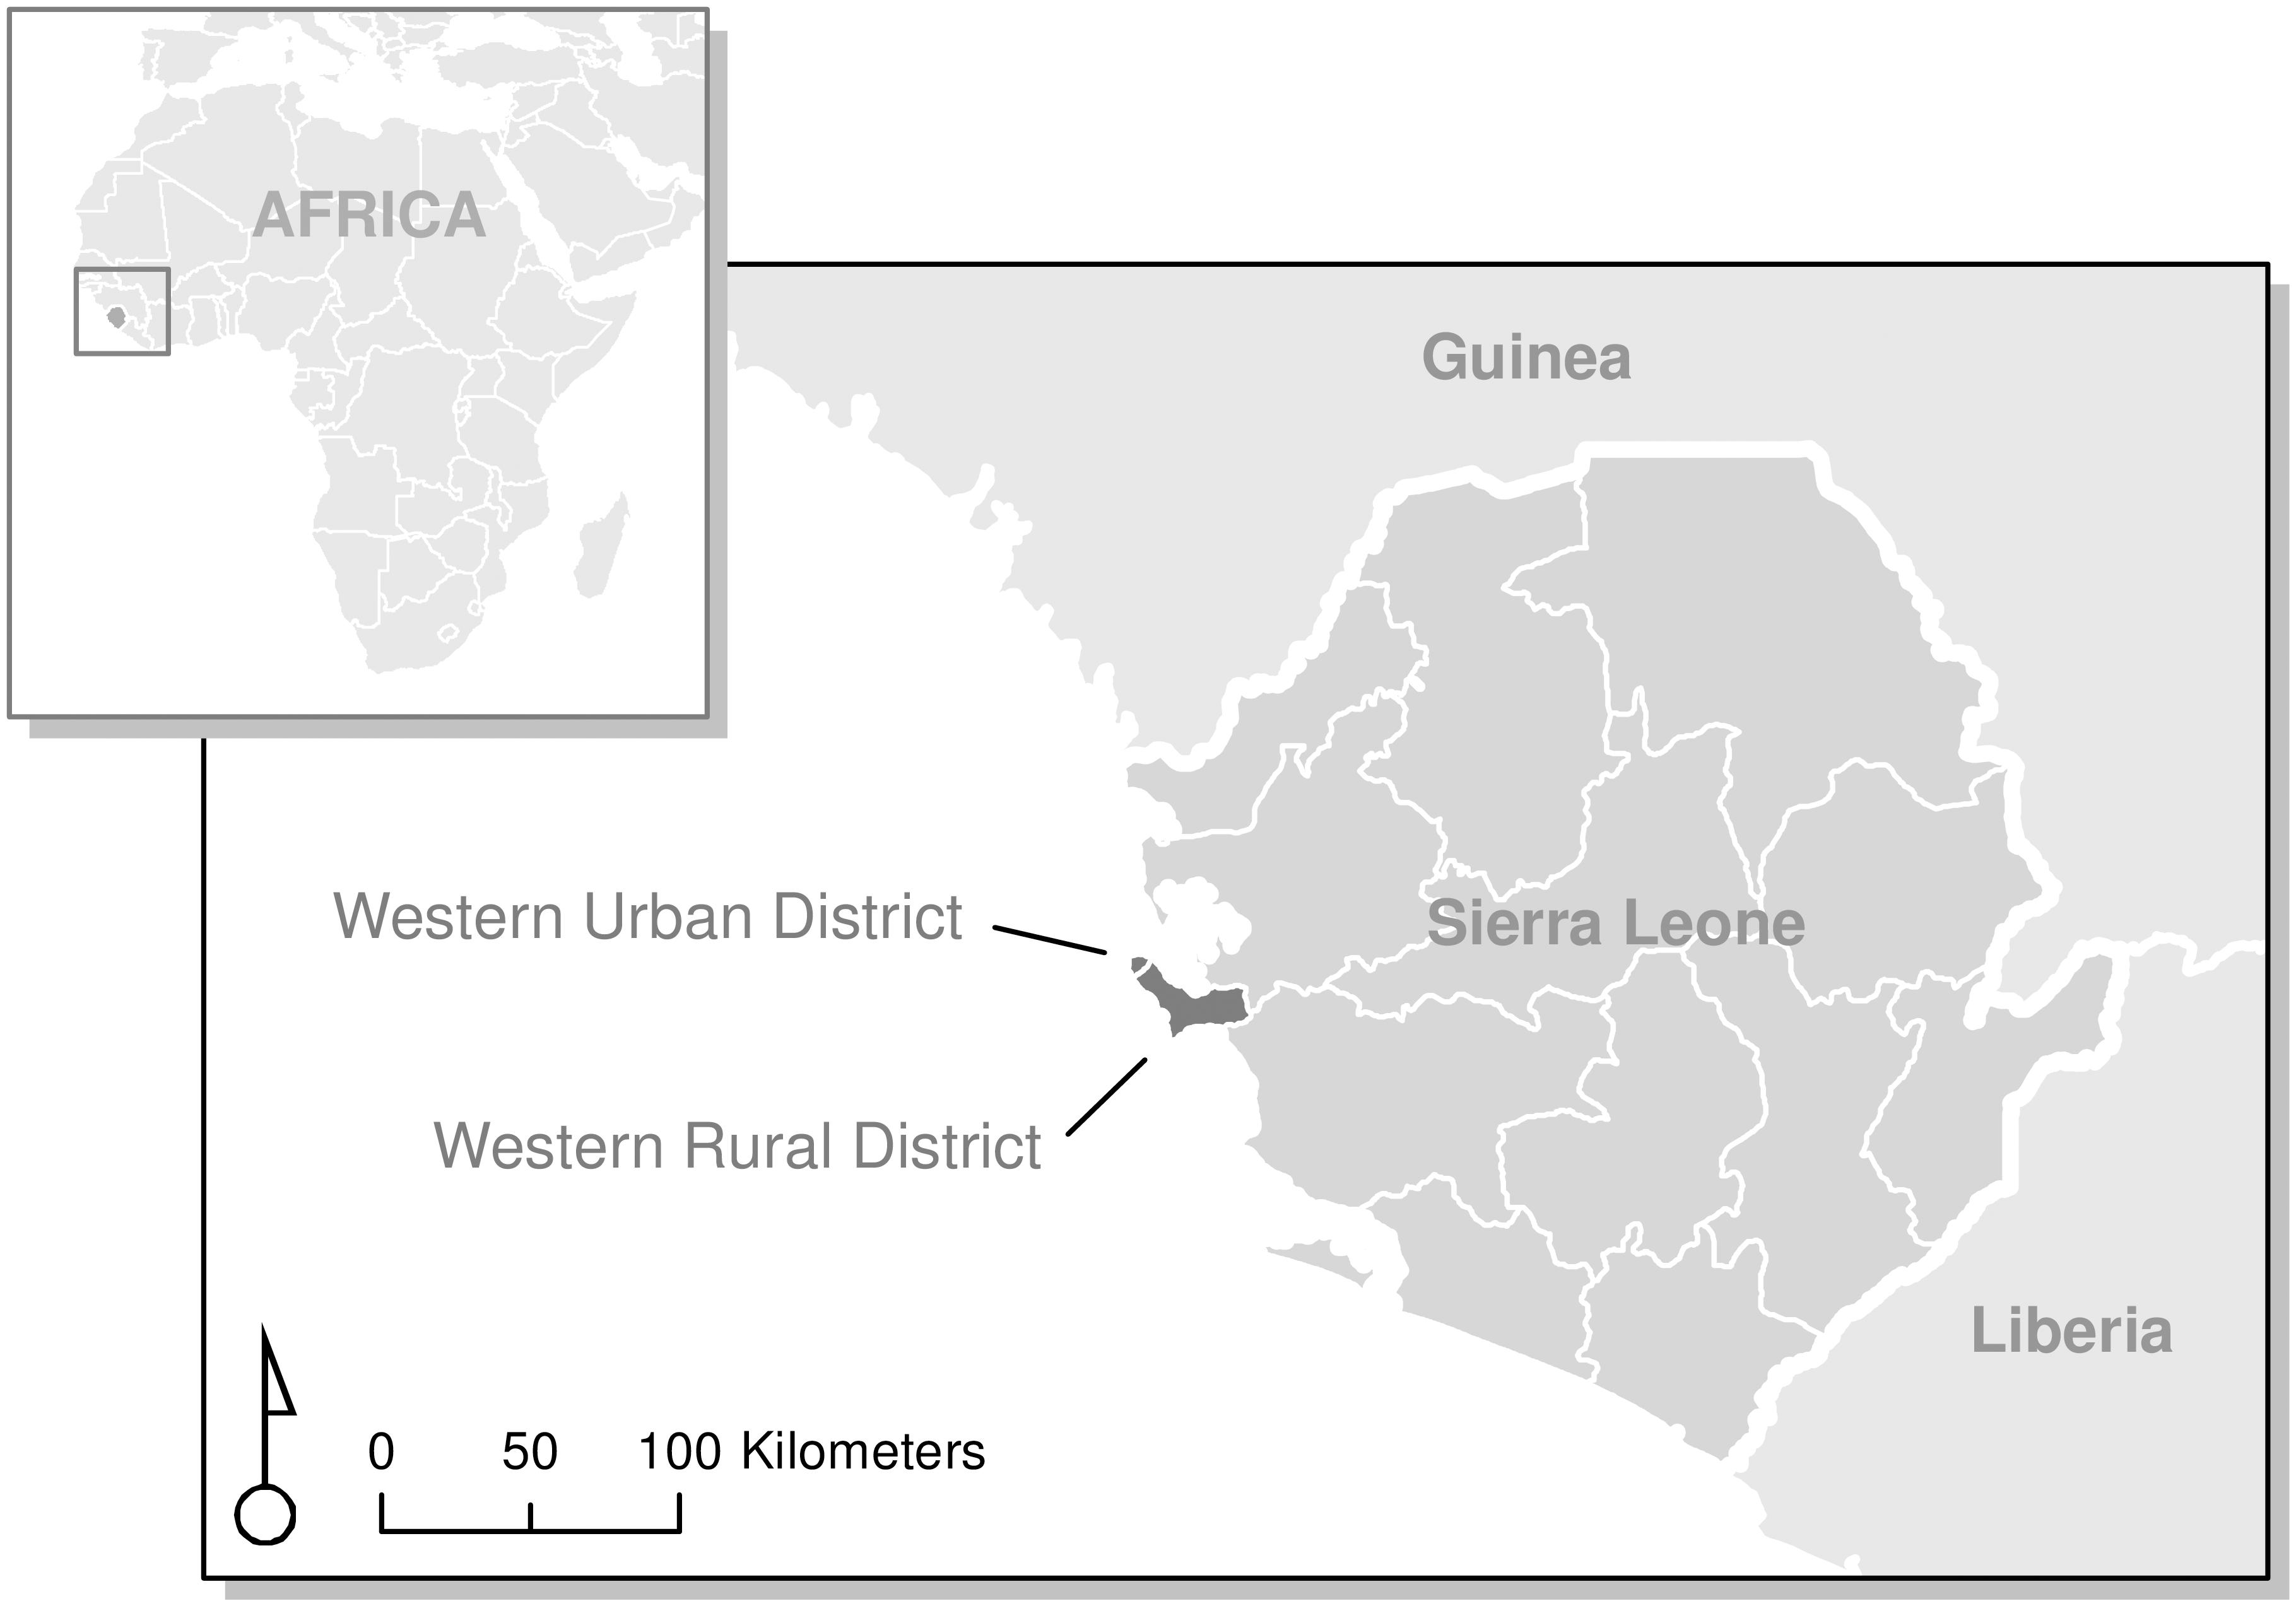 Sampled districts (Western Urban and Western Rural) in Sierra Leone.